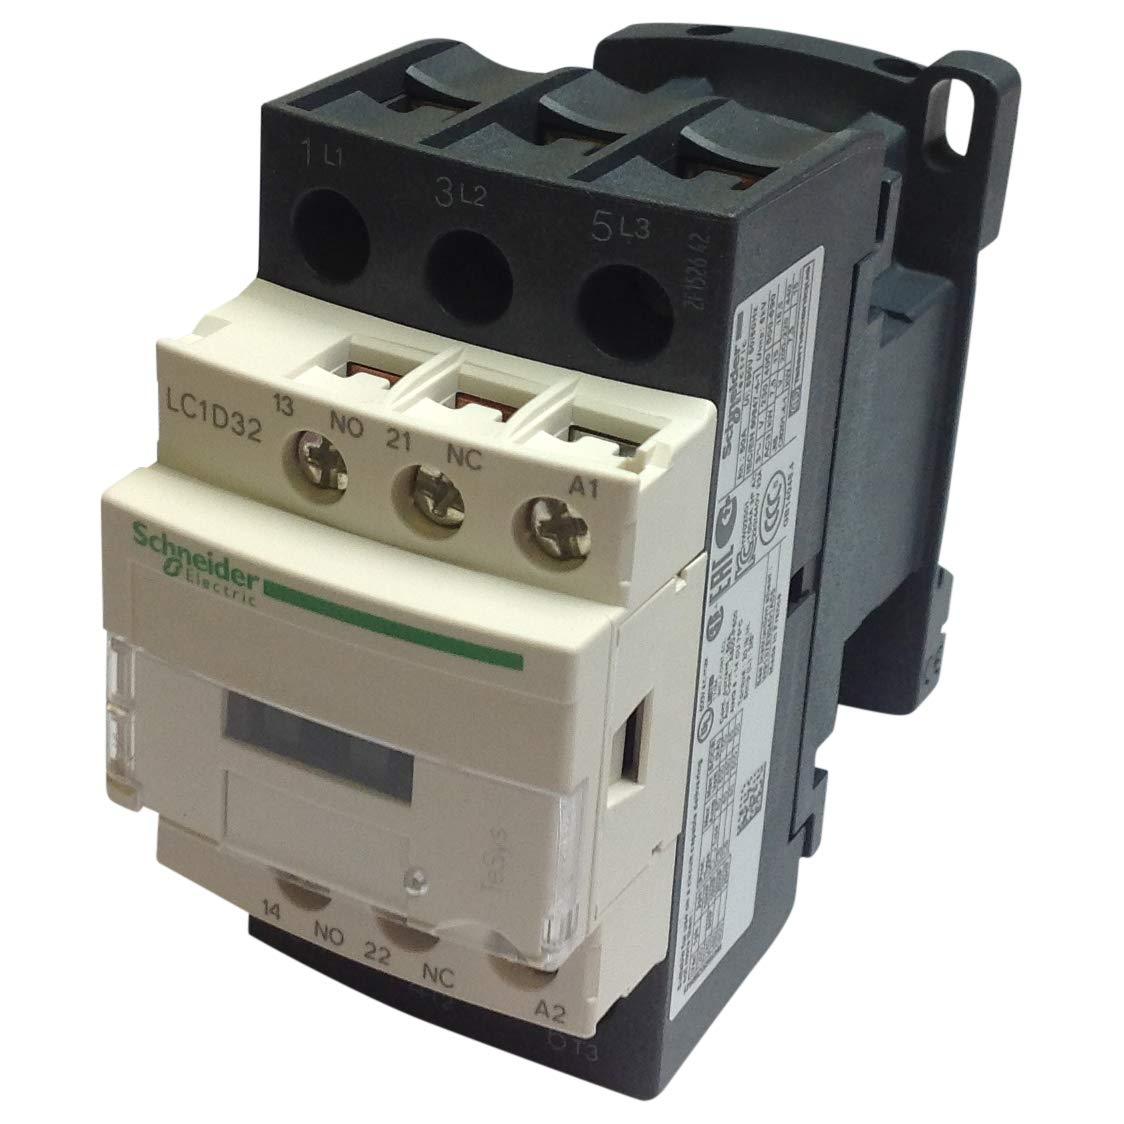 Schneider CONTACTOR 32A 220VAC LC1D32M7 - SCHNEIDER ELECTRIC LC1D32M7